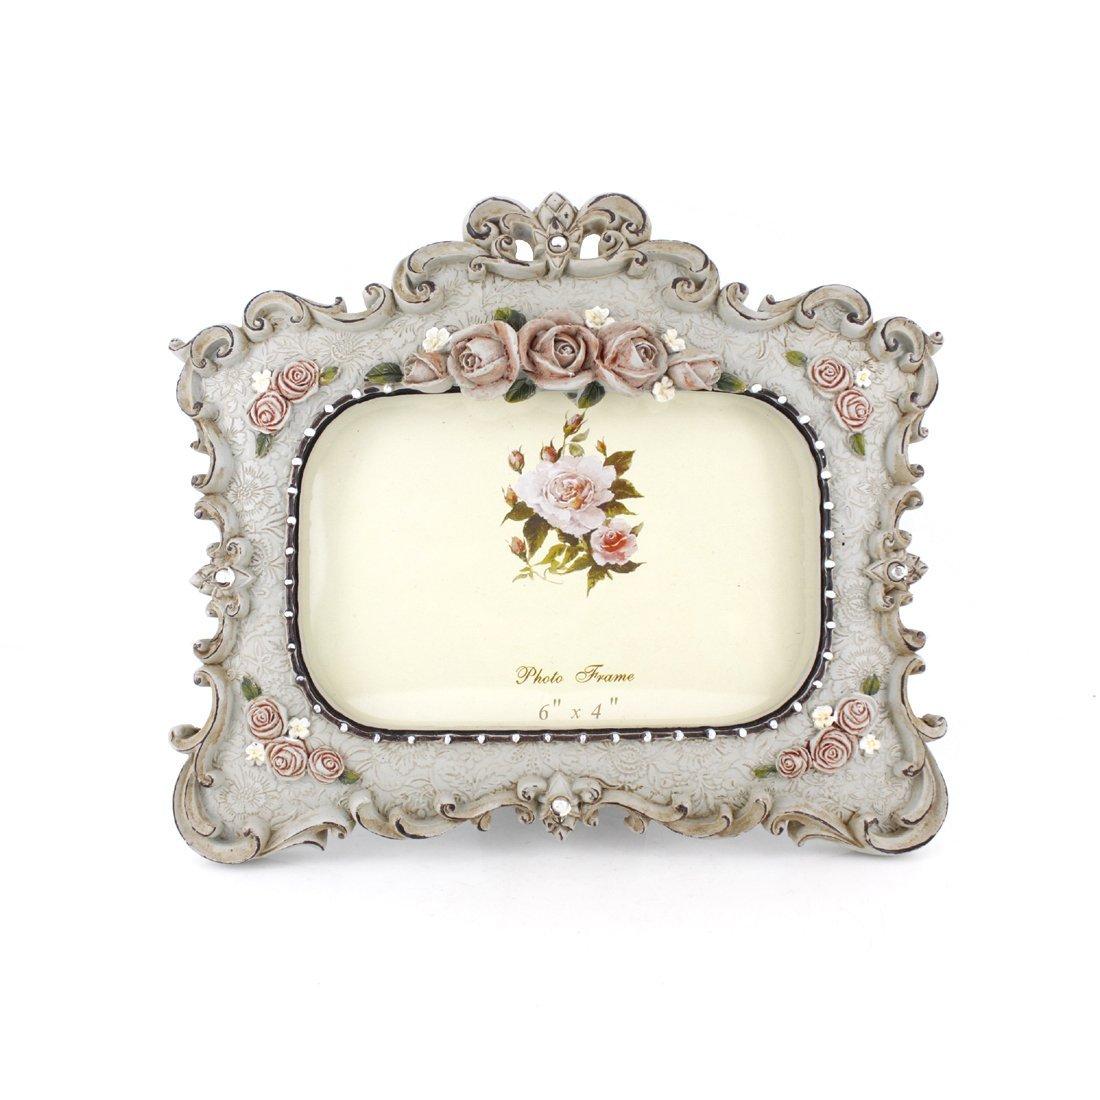 4x6-inch Victorian Floral Desktop Picture Frame